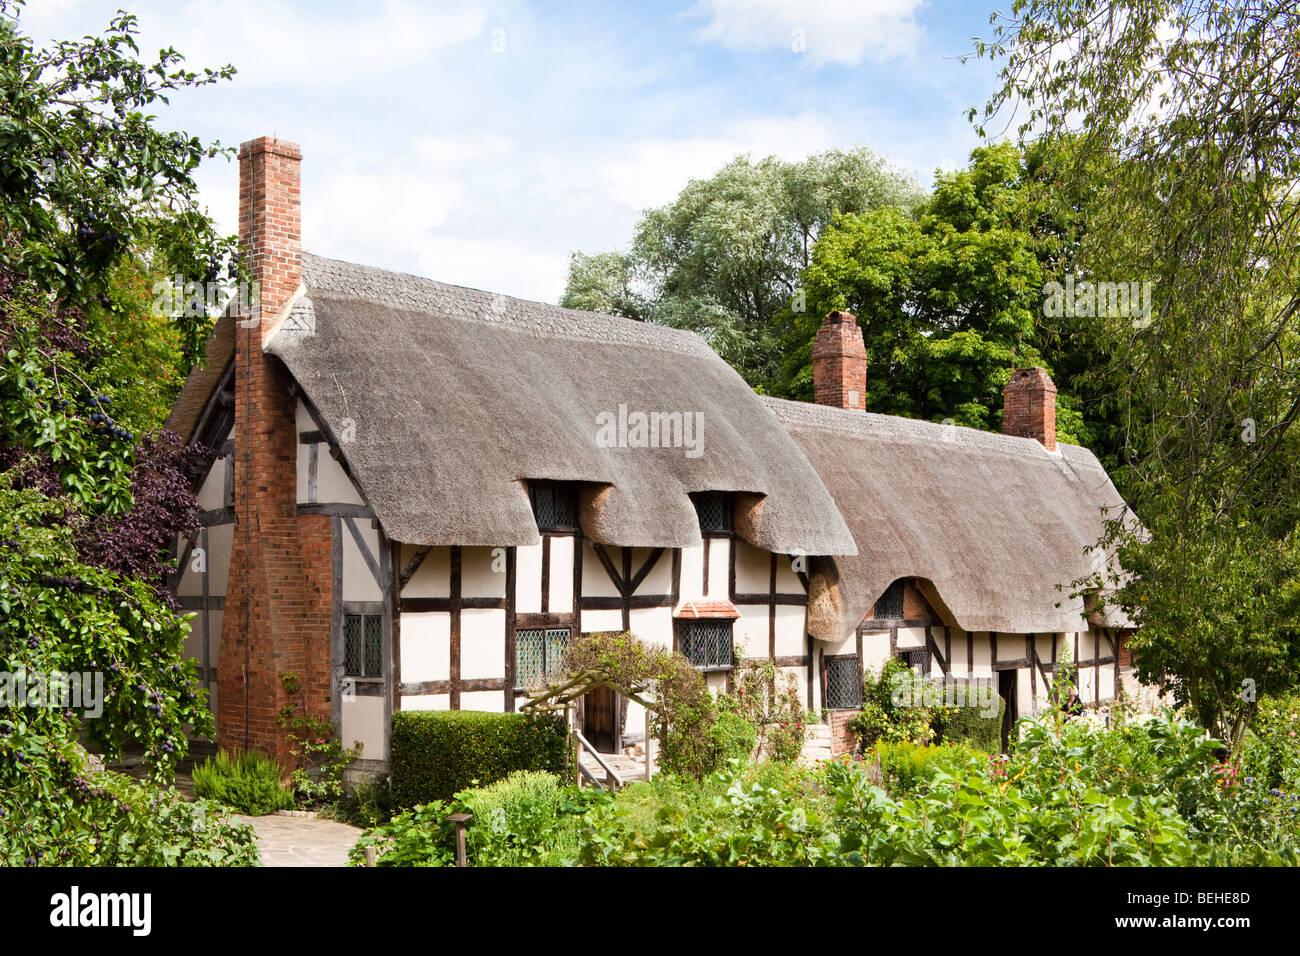 Anne Hathaway's Cottag... Anne Hathaway's Cottage